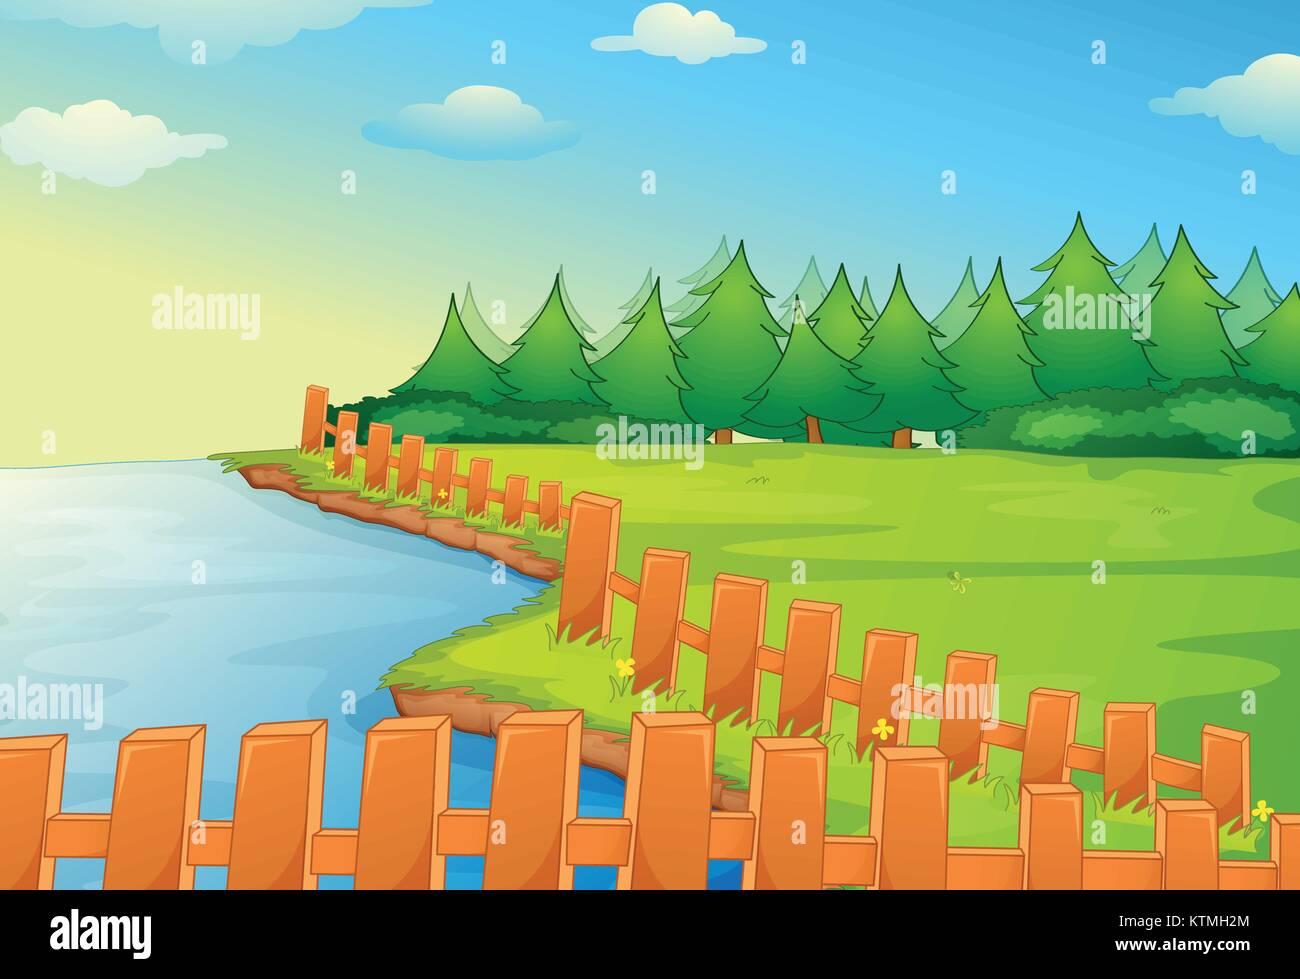 Illustration of a rural scene - Stock Vector